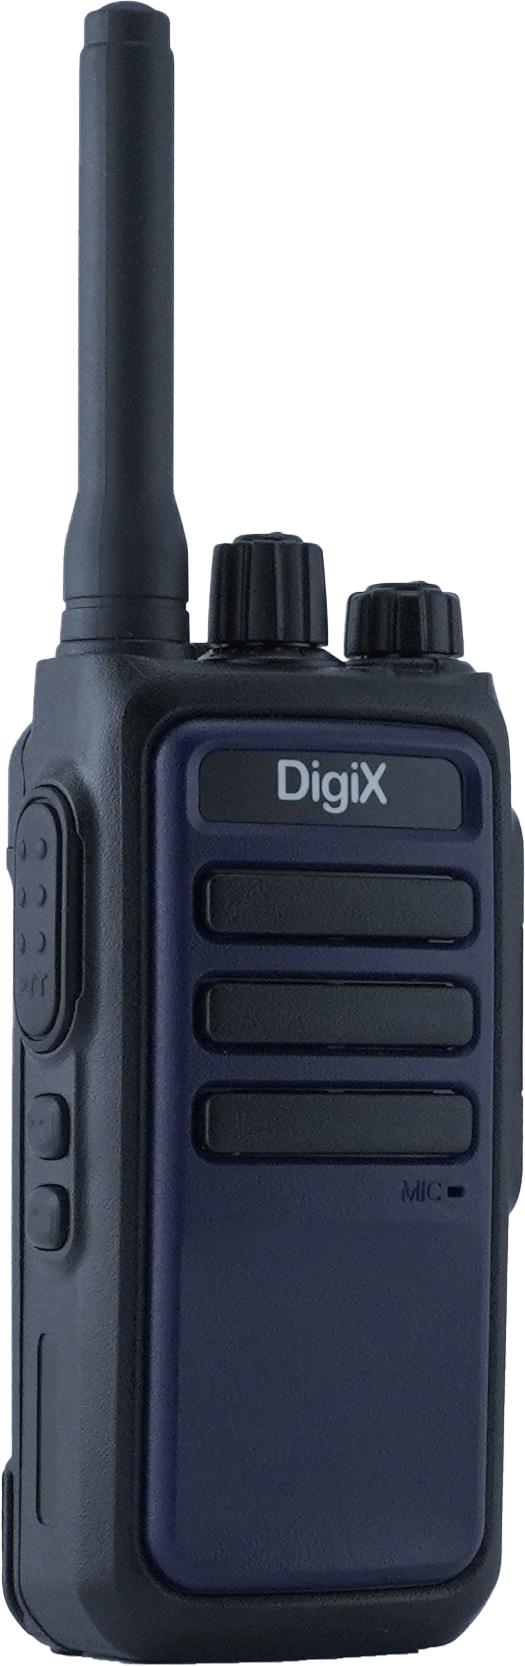 DigiX Sun Blue Front